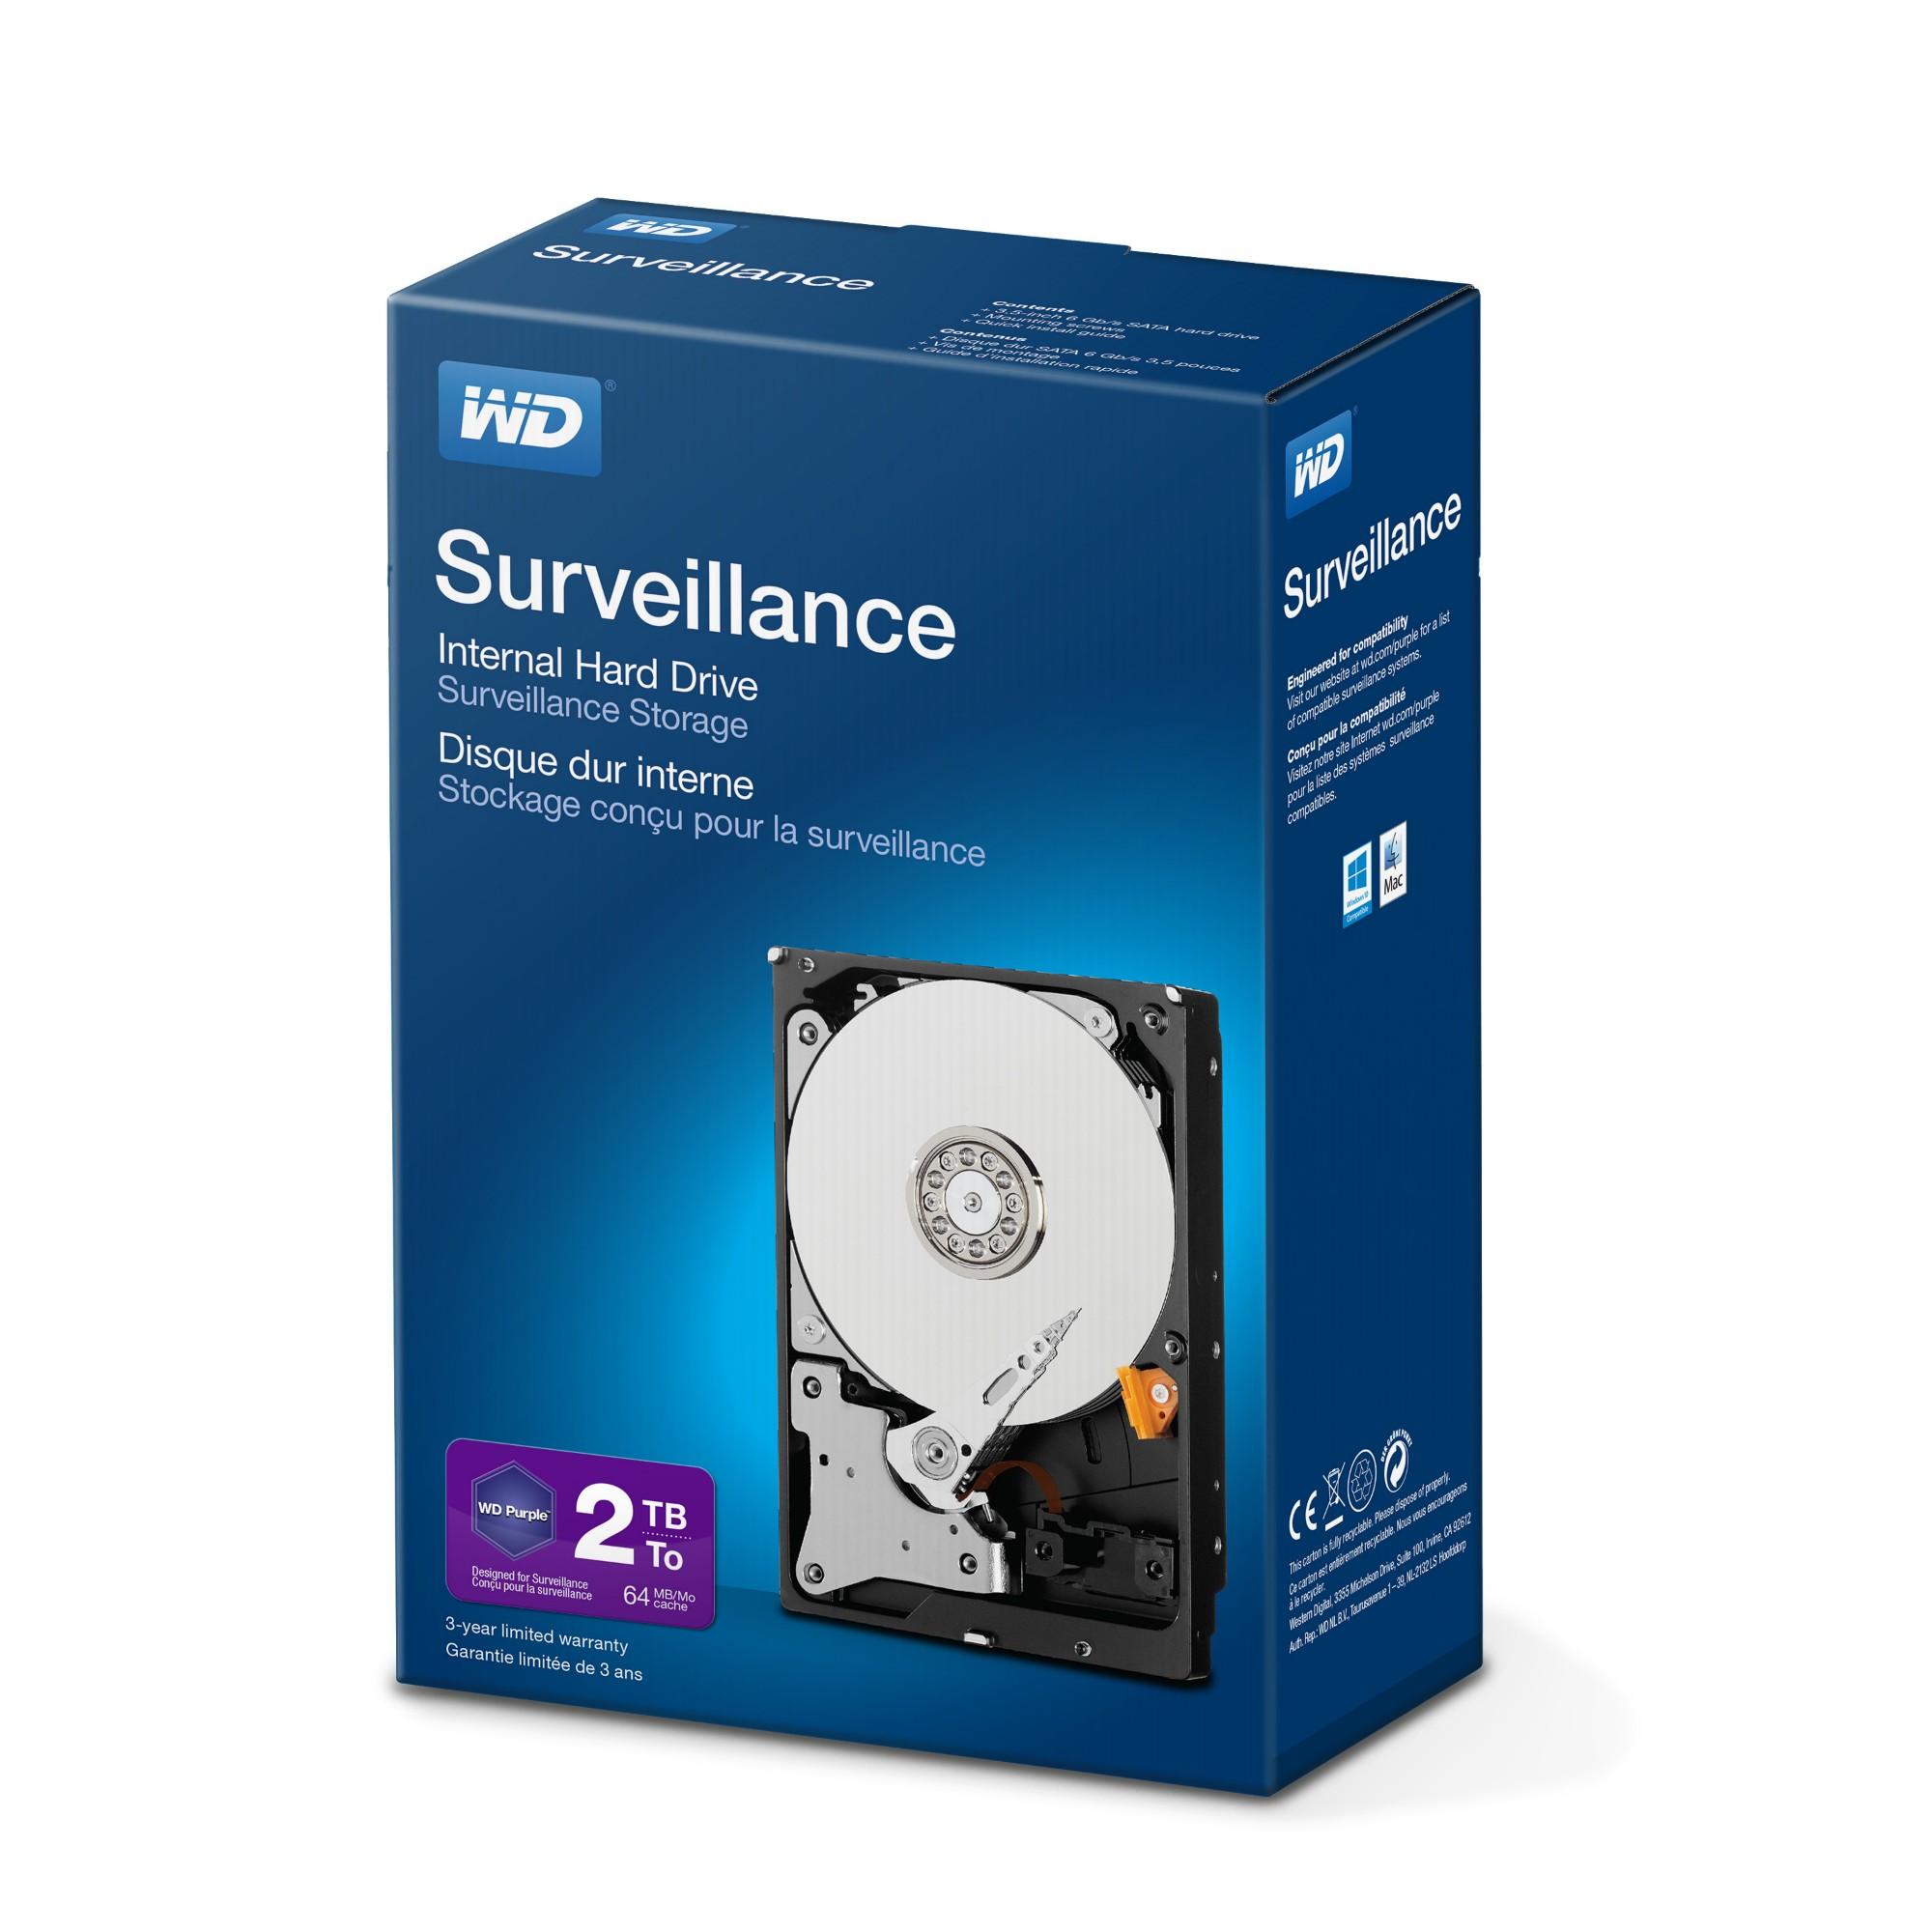 Western Digital Surveillance Storage 2000GB Serial ATA III internal hard drive